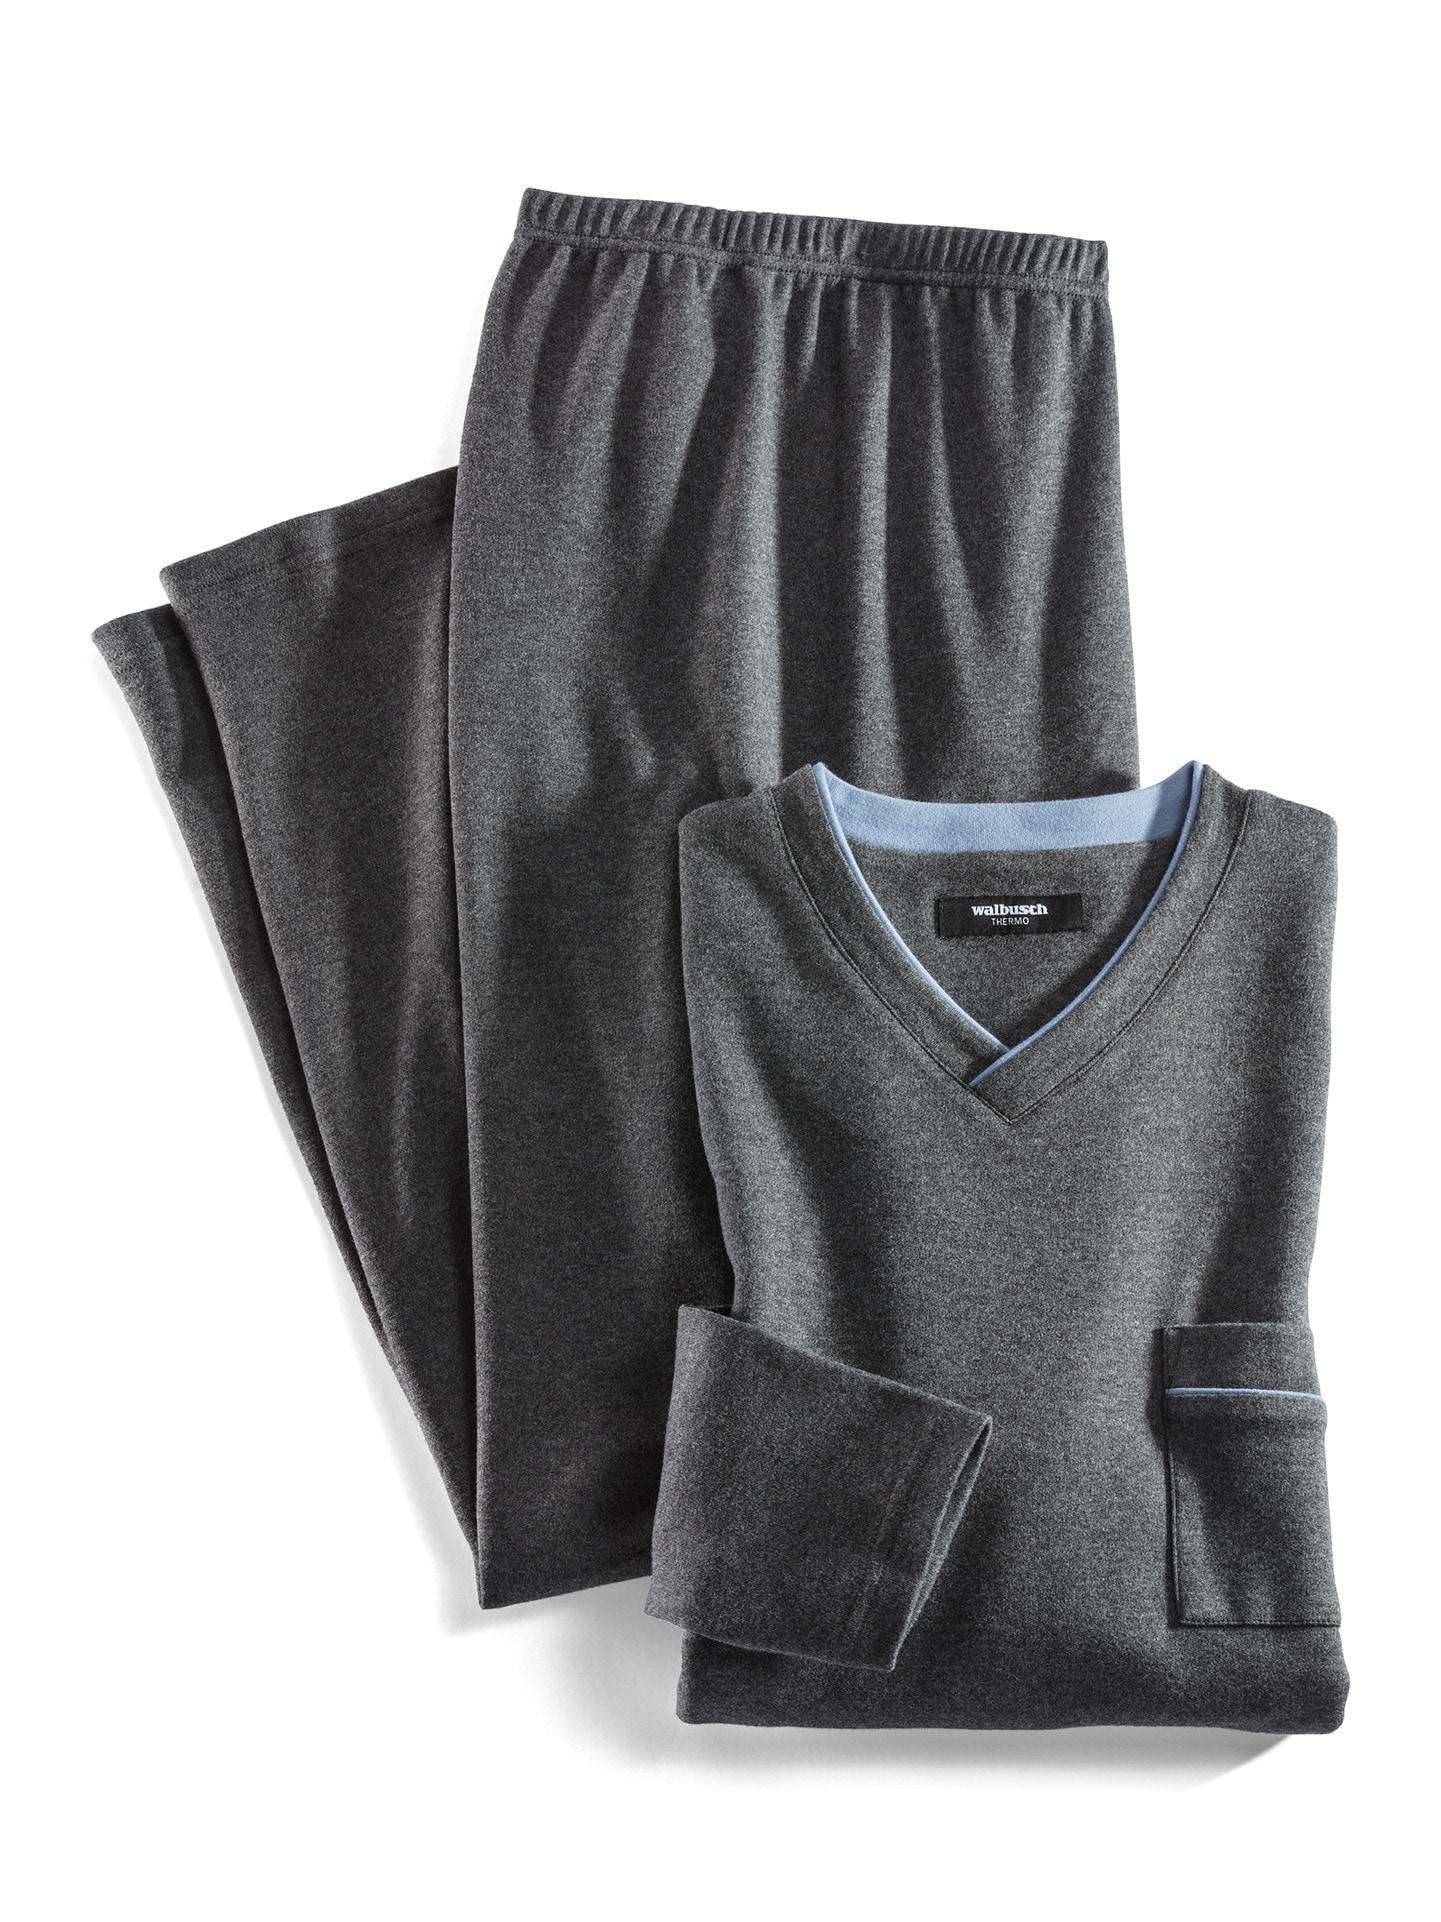 Walbusch Herren Pyjama Thermo Grau einfarbig wärmend 48, 50, 52, 54, 56, 58/60, 62/64 22-1498-6_MV8880